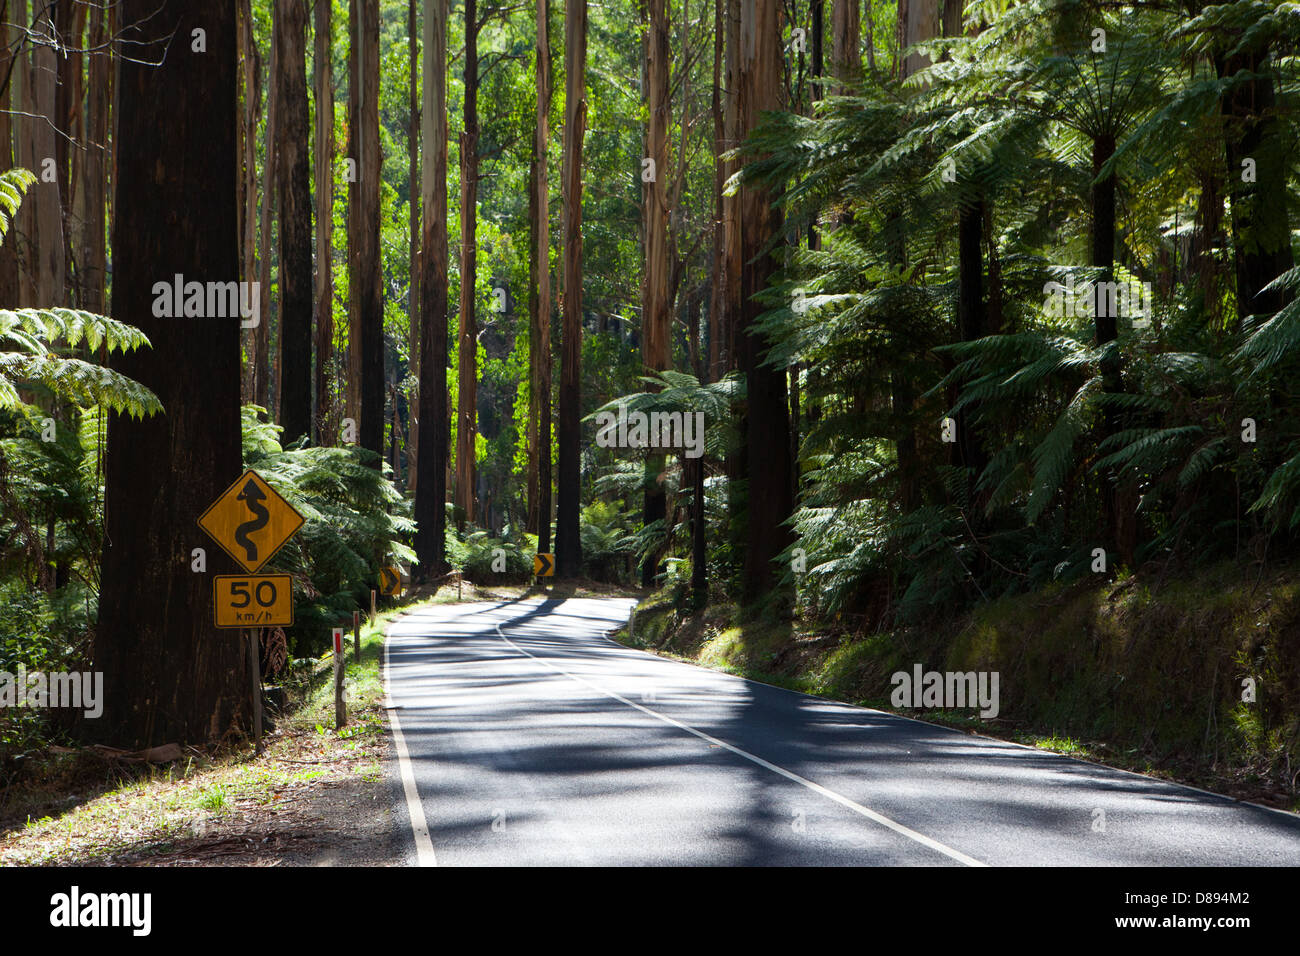 The Black Spur near Healesville, Victoria, Australia - Stock Image